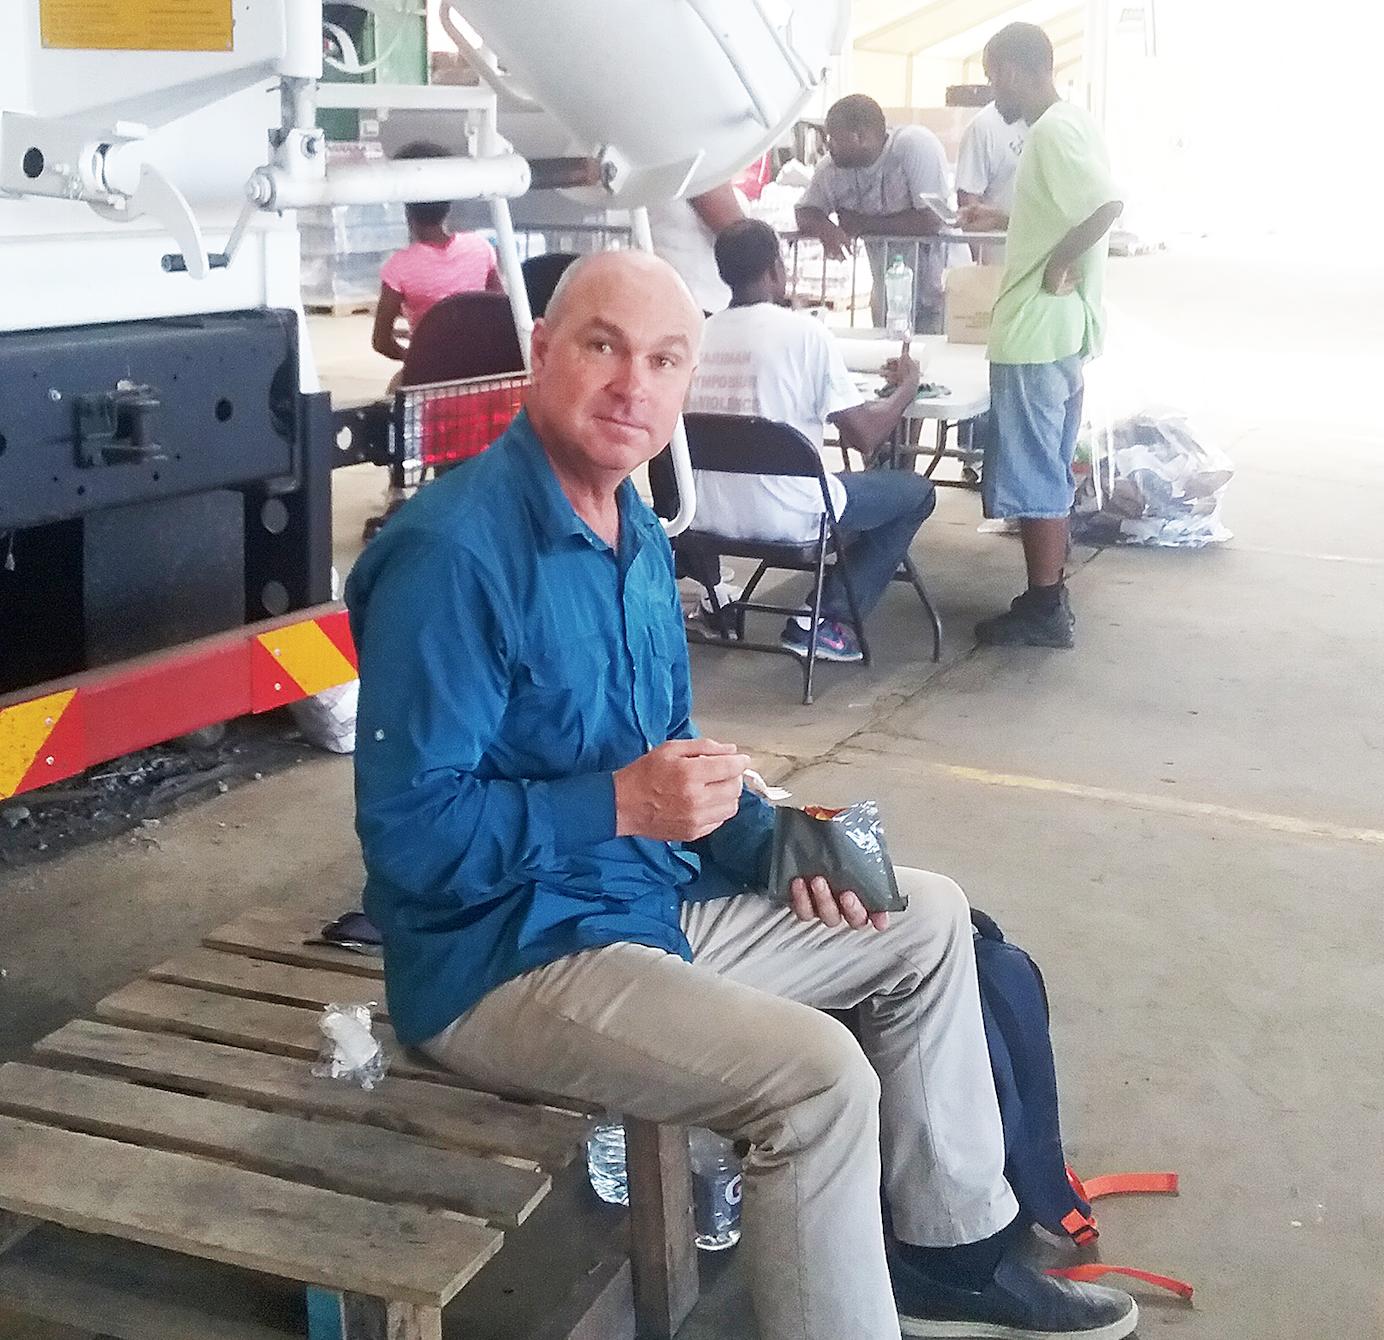 Jeff, a ShelterBox Australia response team volunteer